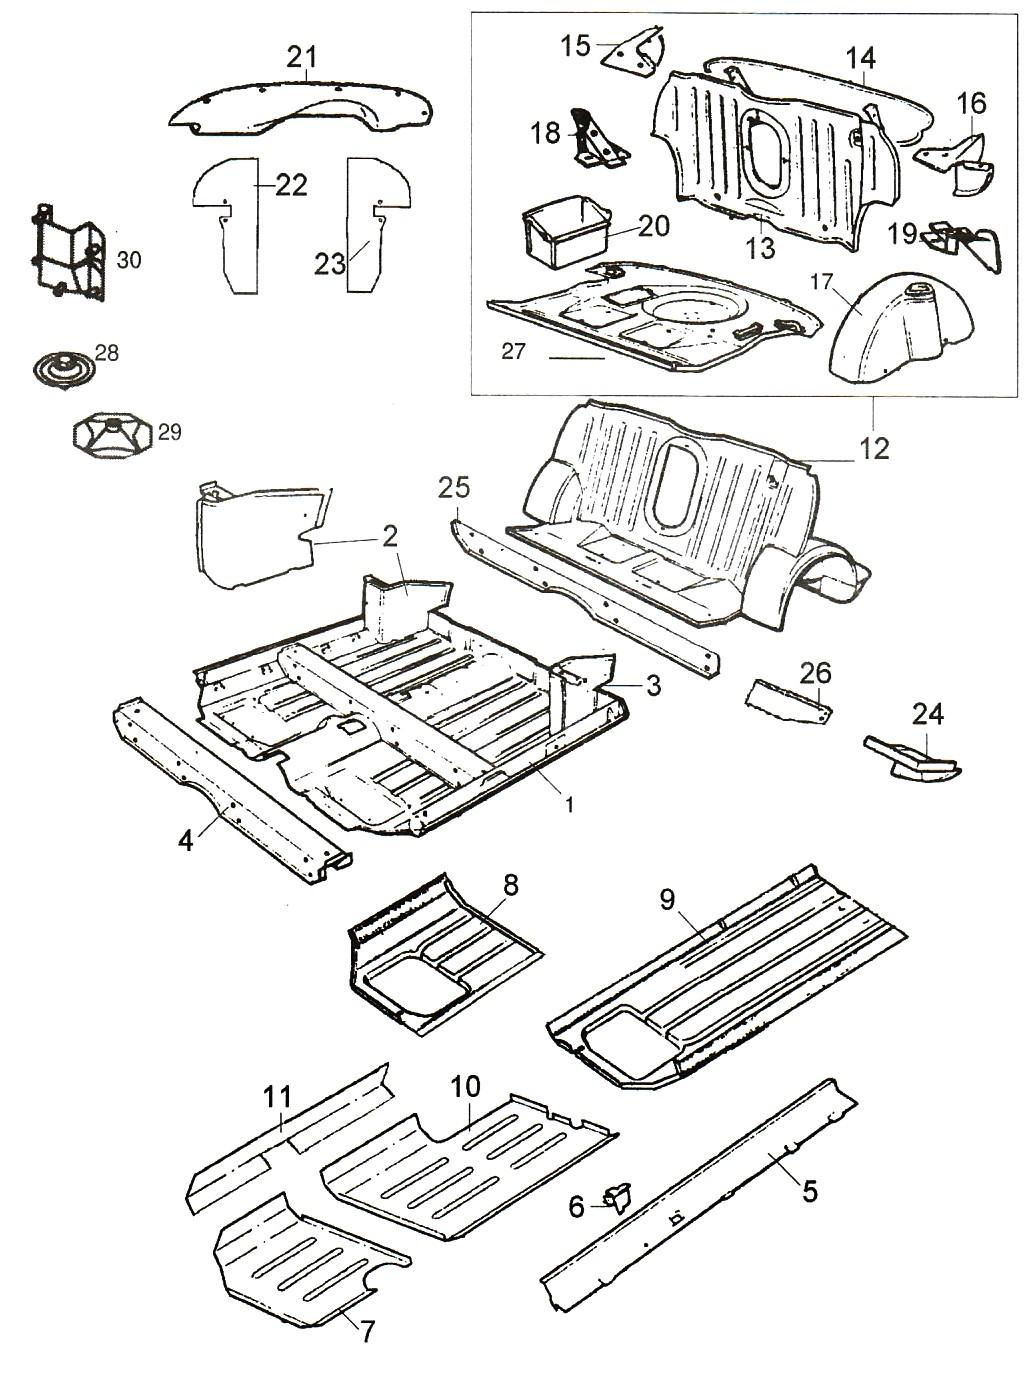 MINI Catalog Page 12-11